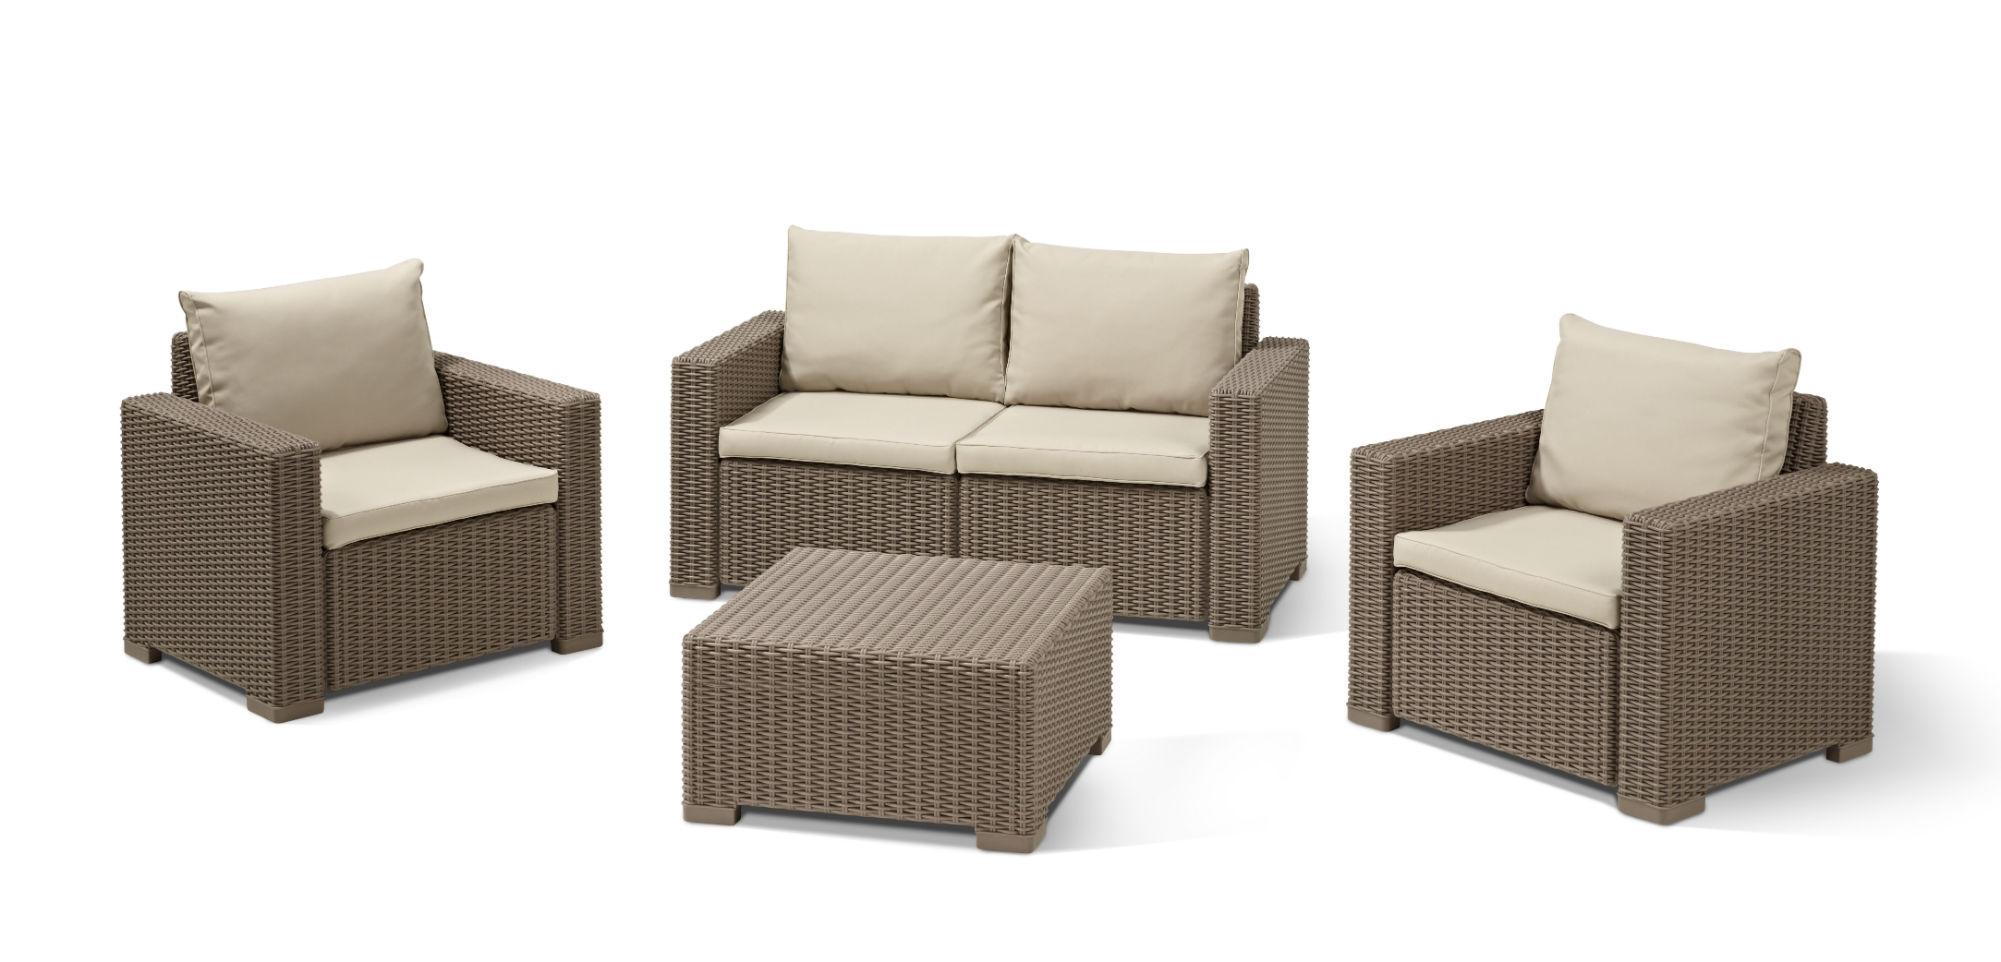 Loungeset | Lounge Sets - Allibert pour Salon De Jardin Allibert California